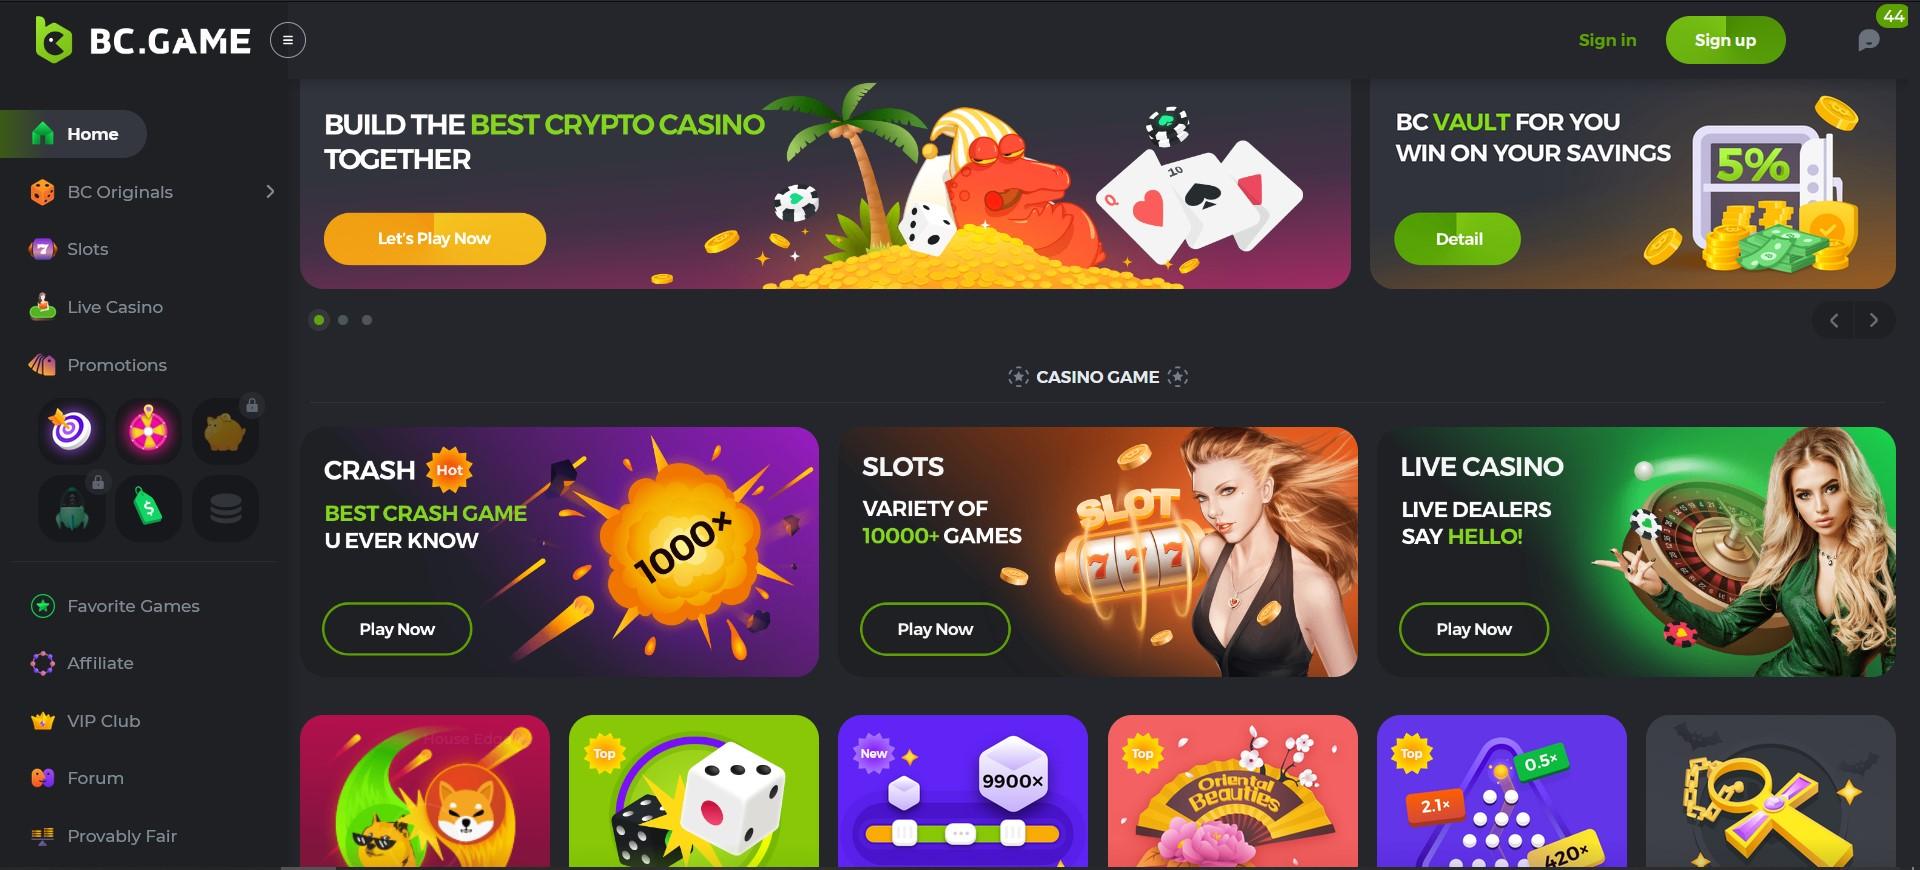 BC.Game Online Casino